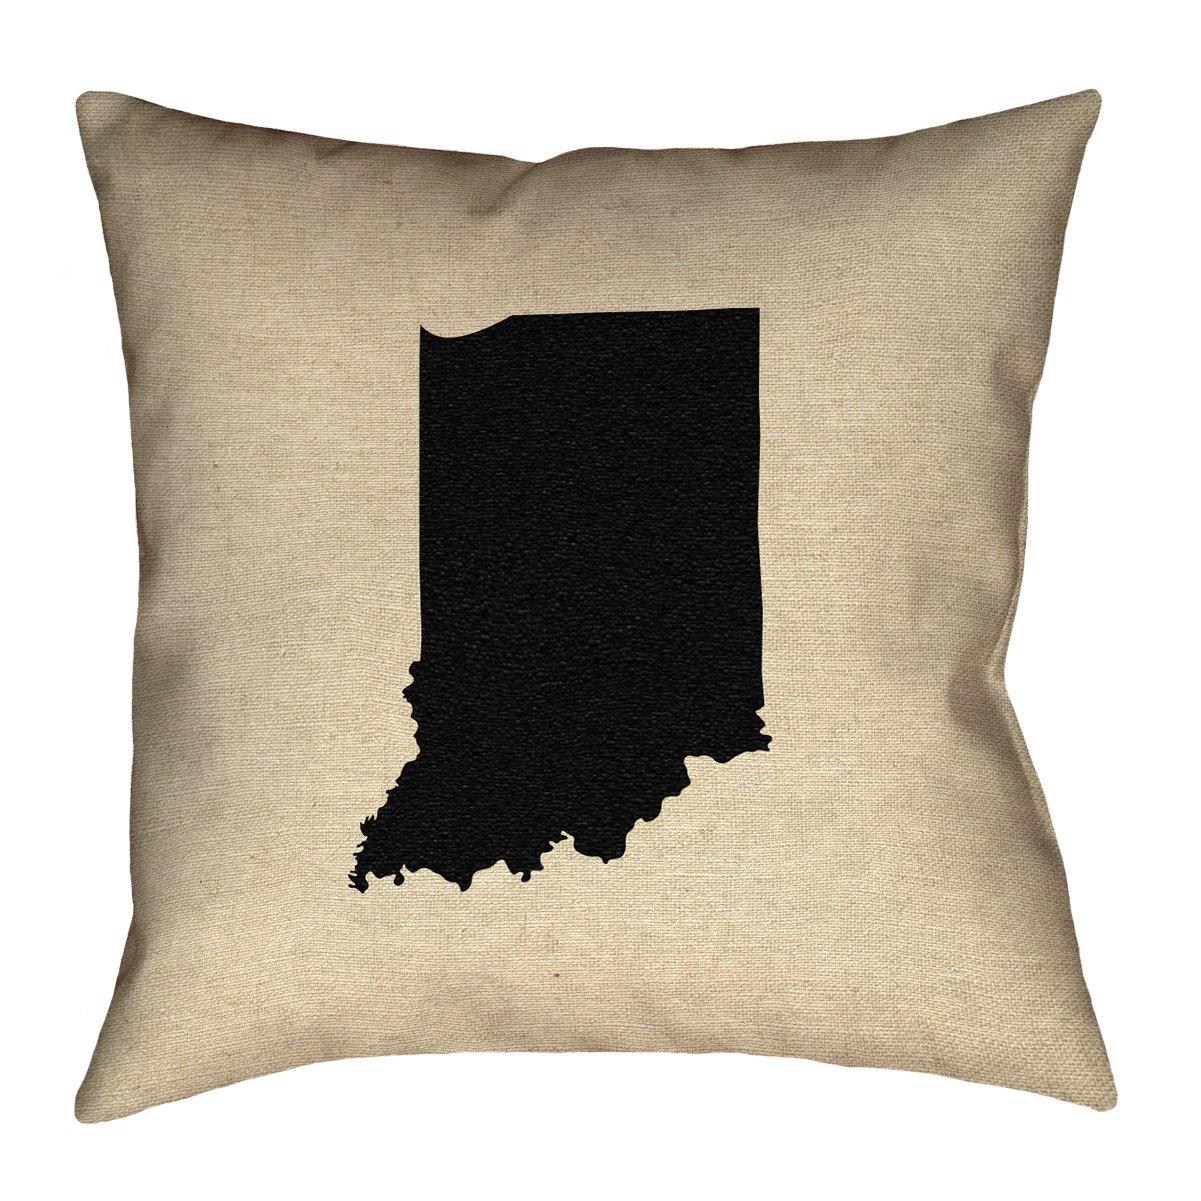 ArtVerse Katelyn Smith 14 x 14 Spun Polyester Indiana Pillow